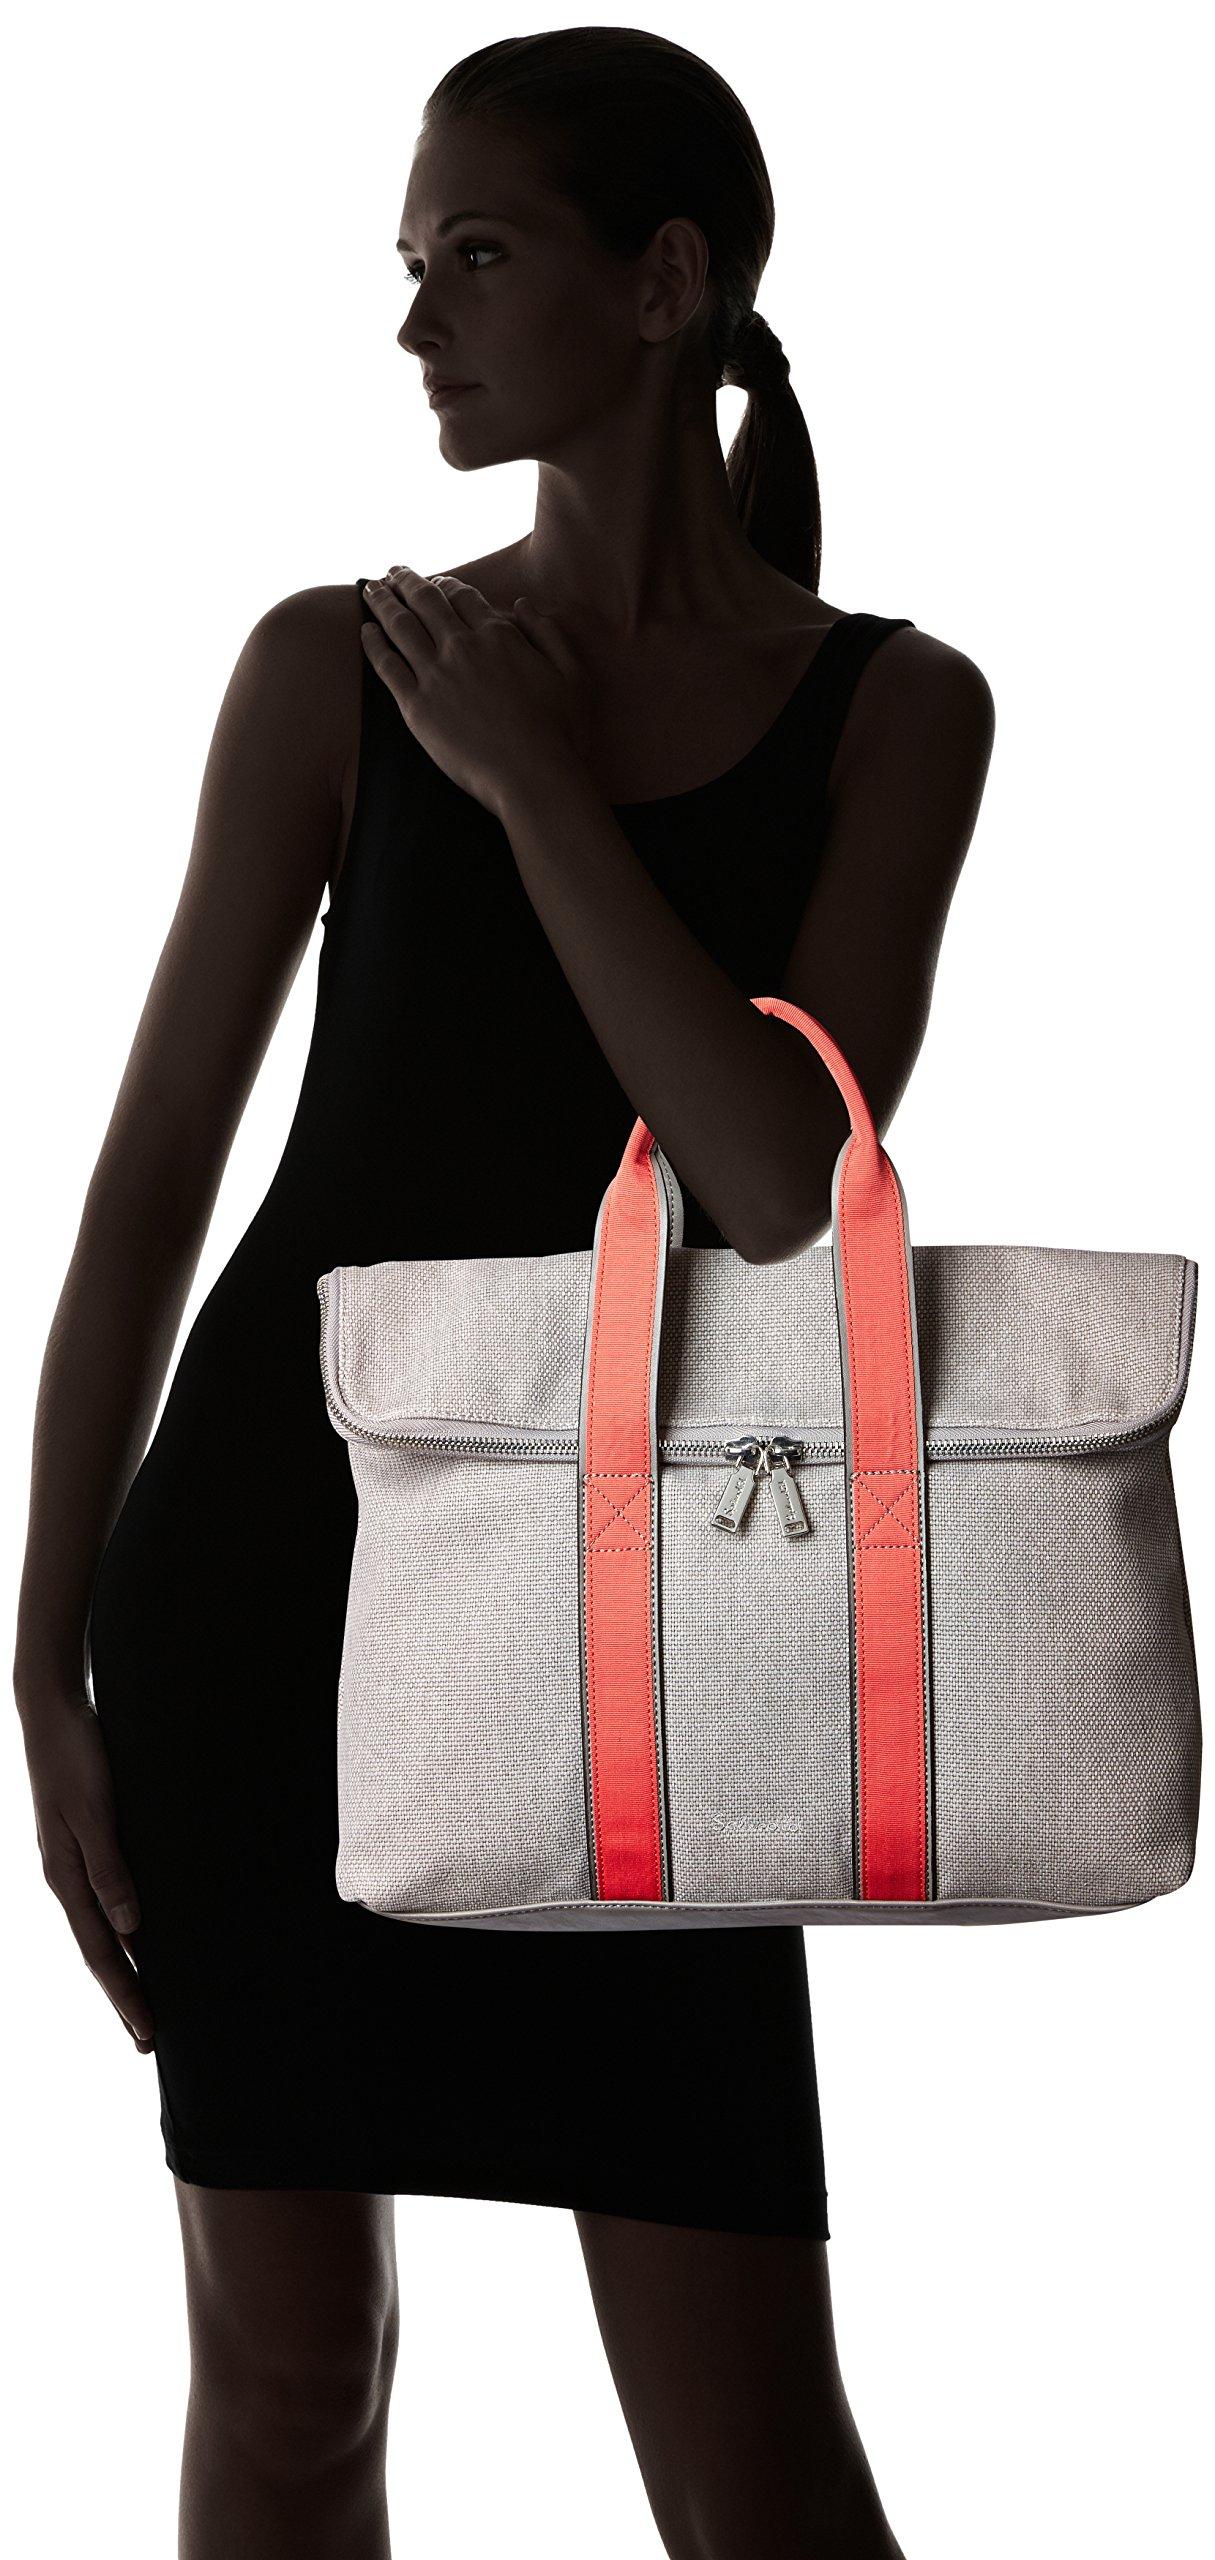 Splendid Cape May Satchel Top Handle Bag, Grey, One Size by Splendid (Image #6)